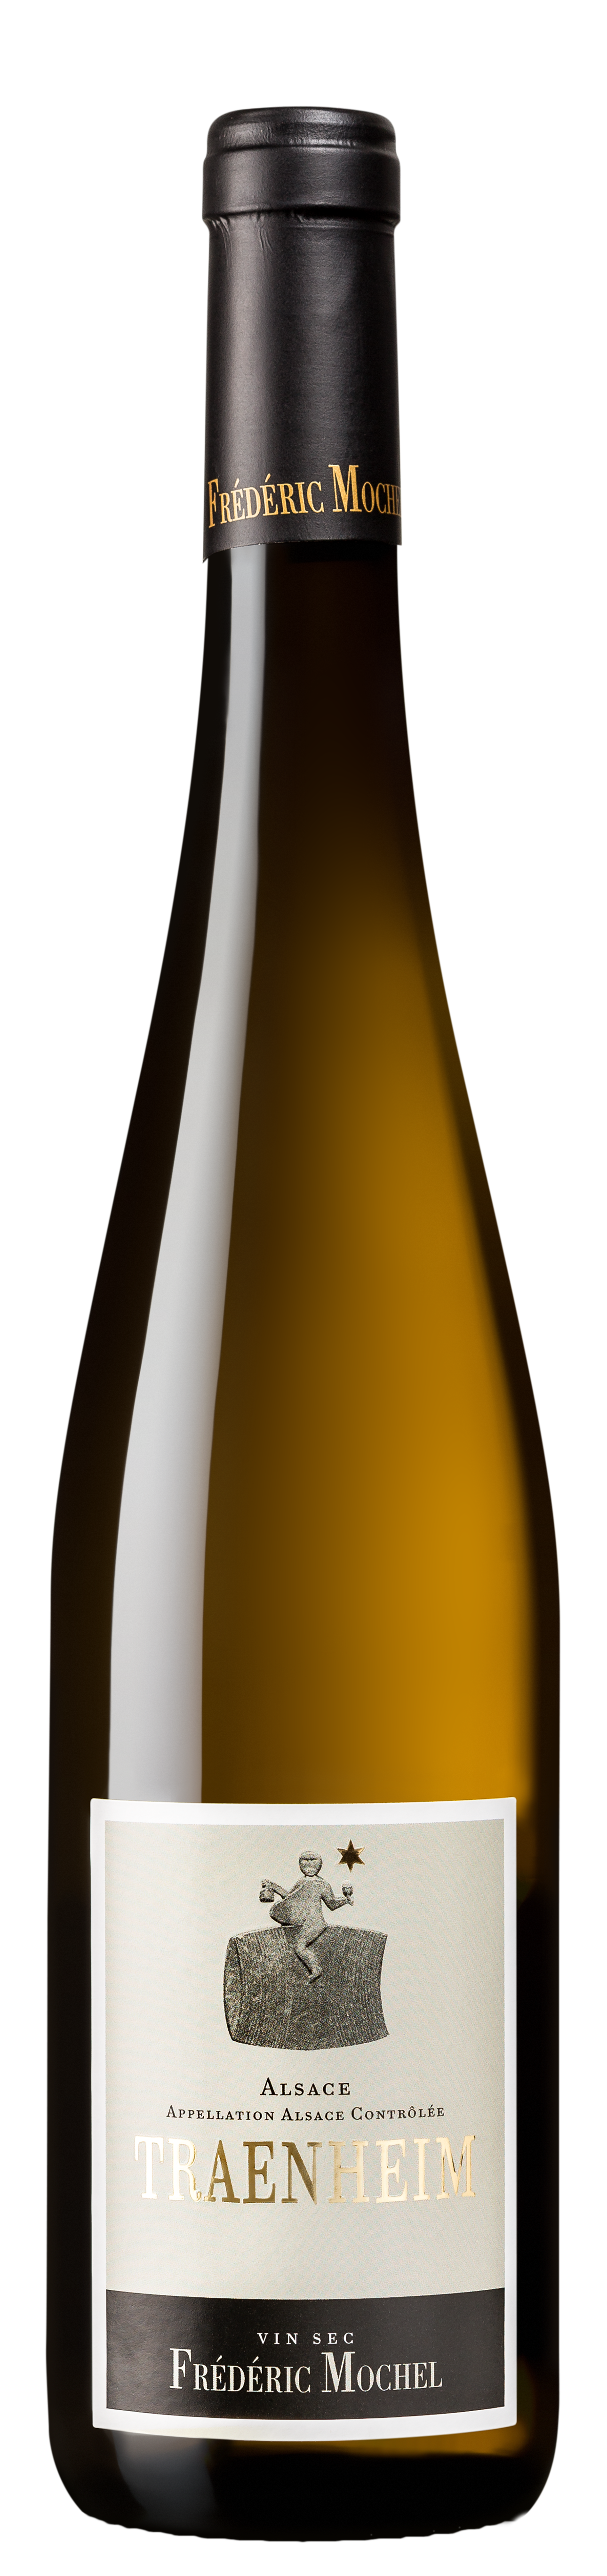 traenheim